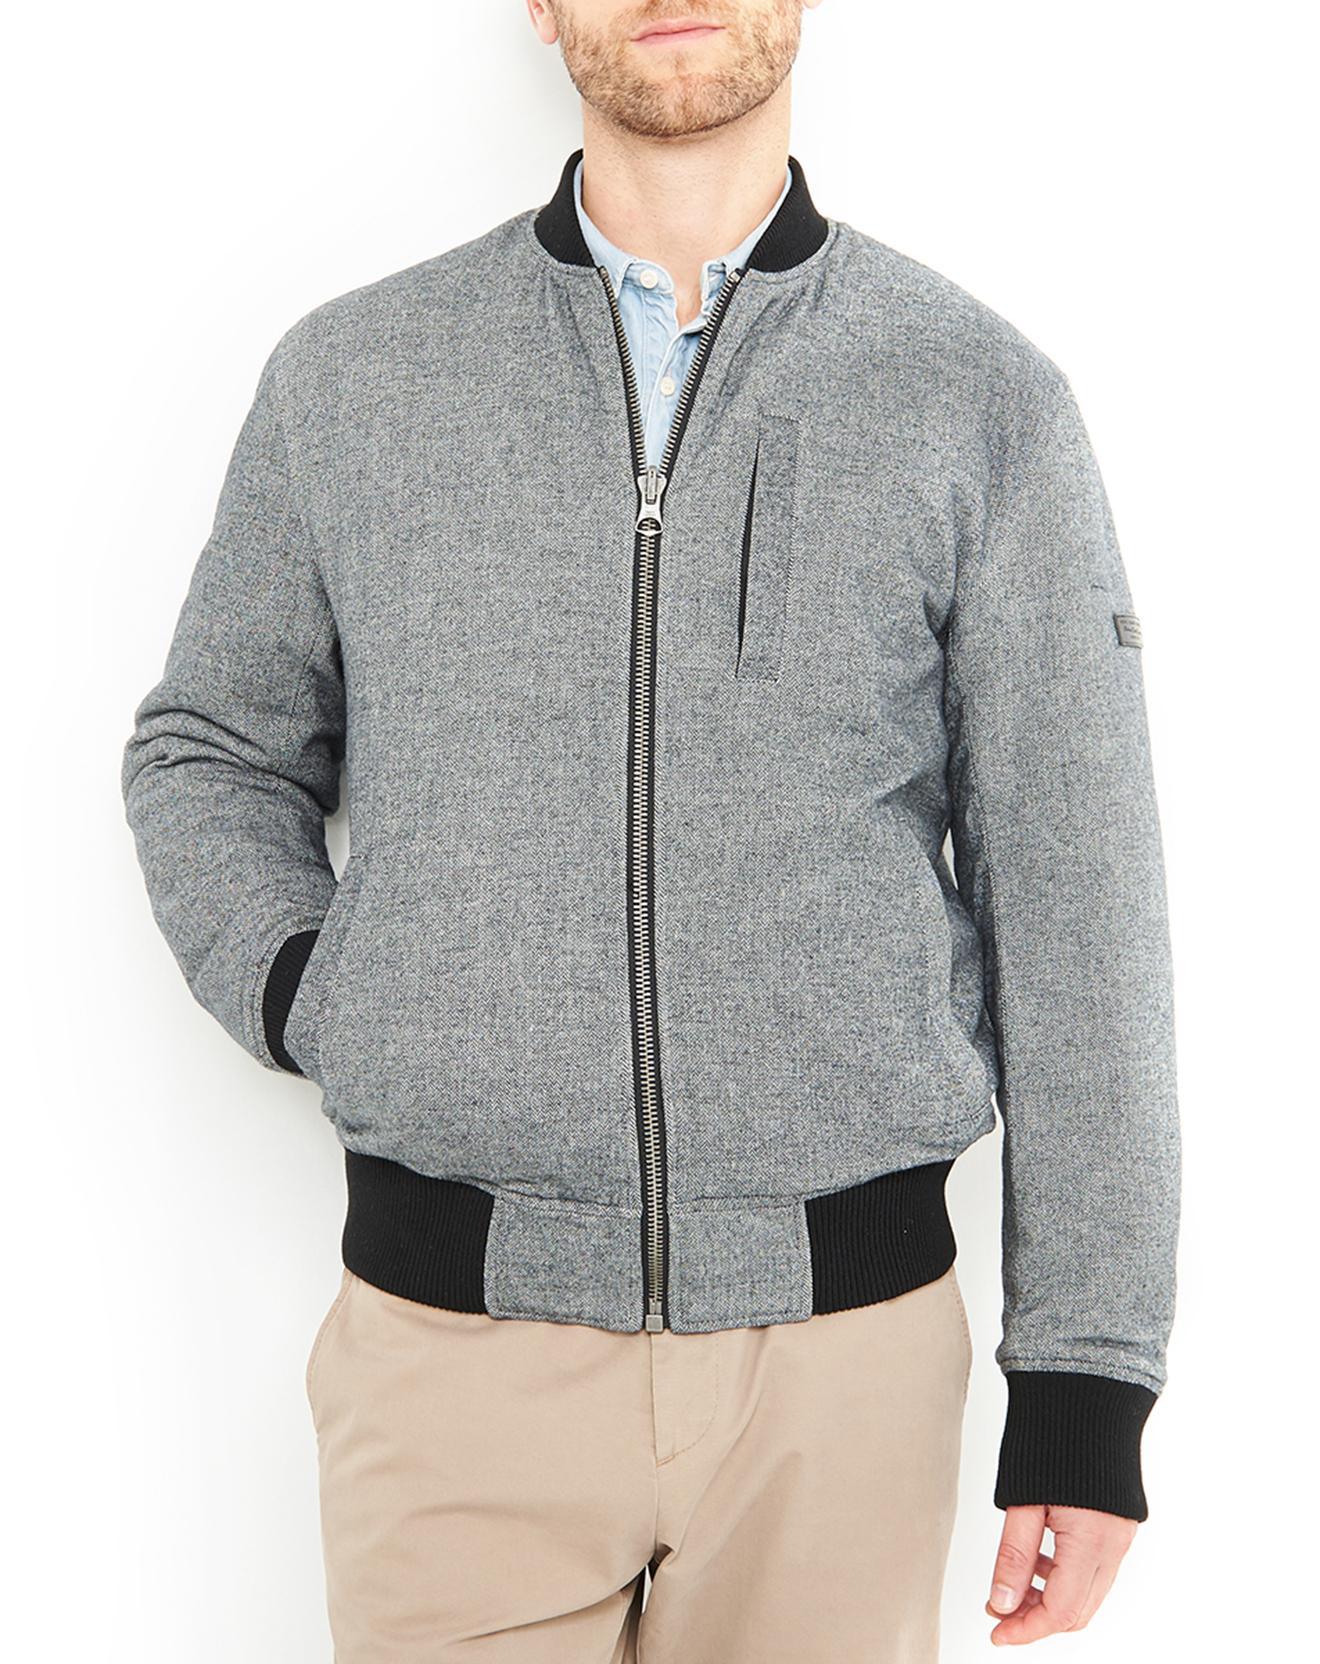 Blouson réversible Eubea gris - Pepe Jeans - Modalova